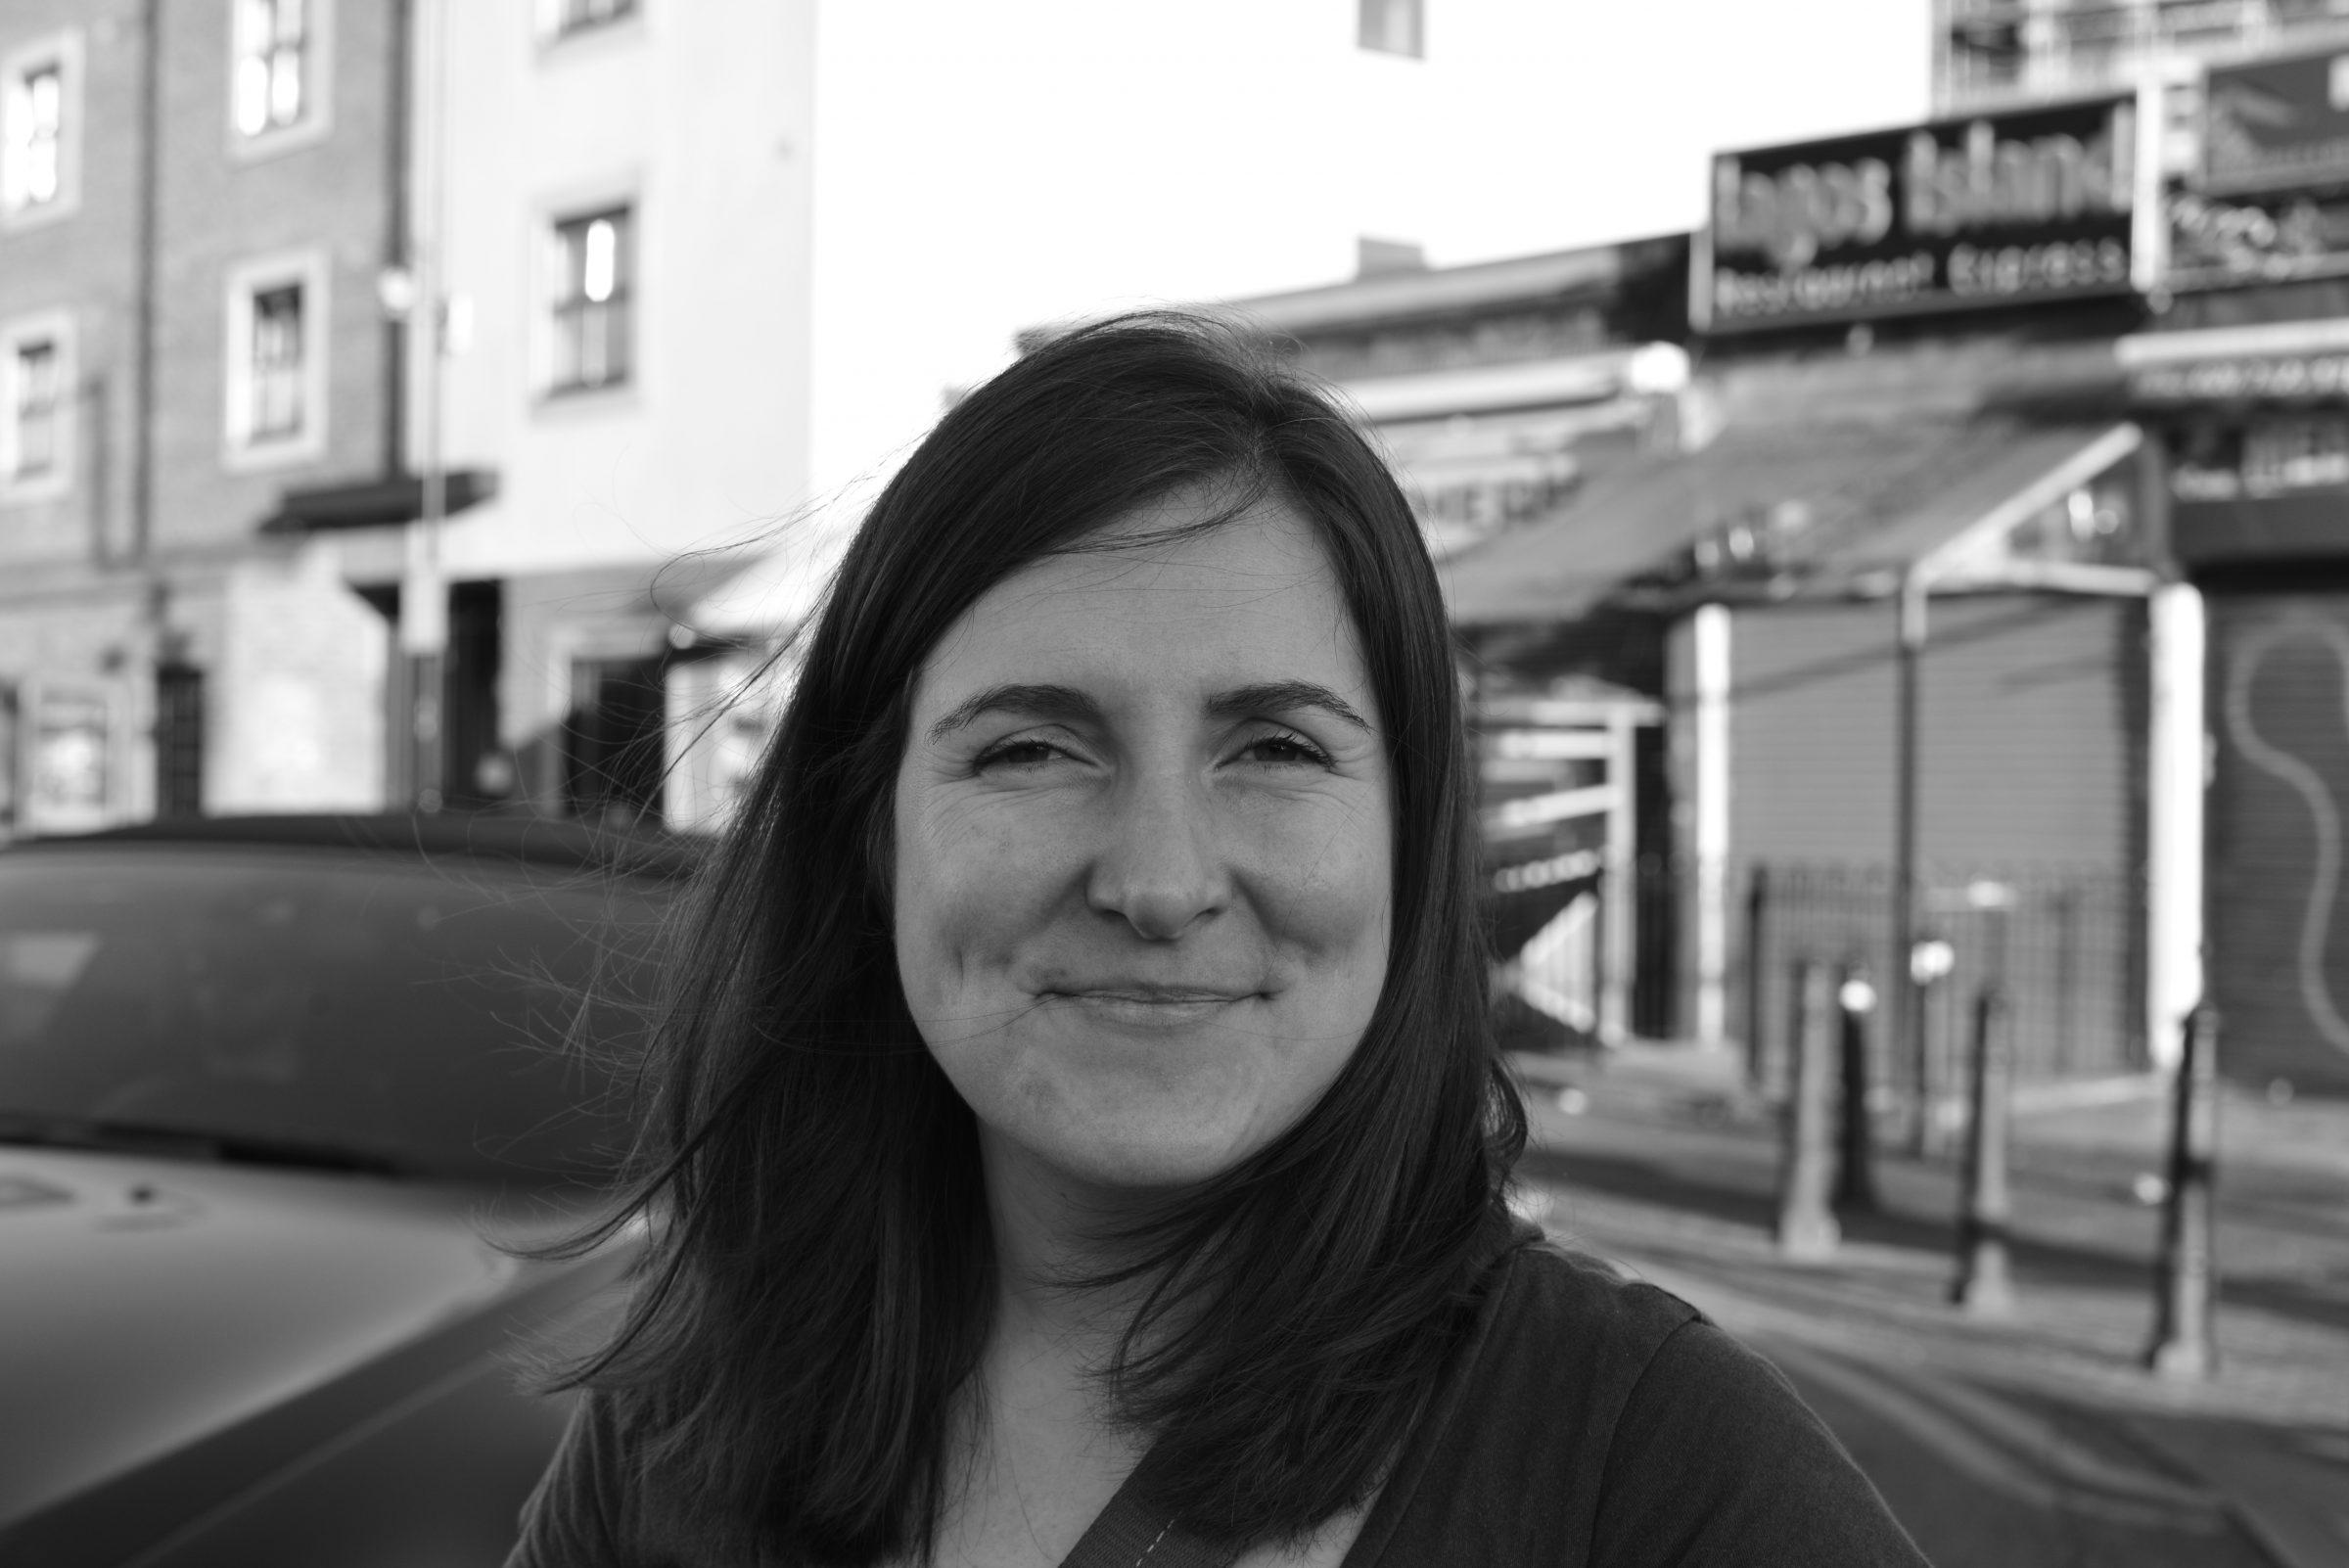 Zeena Fieldman